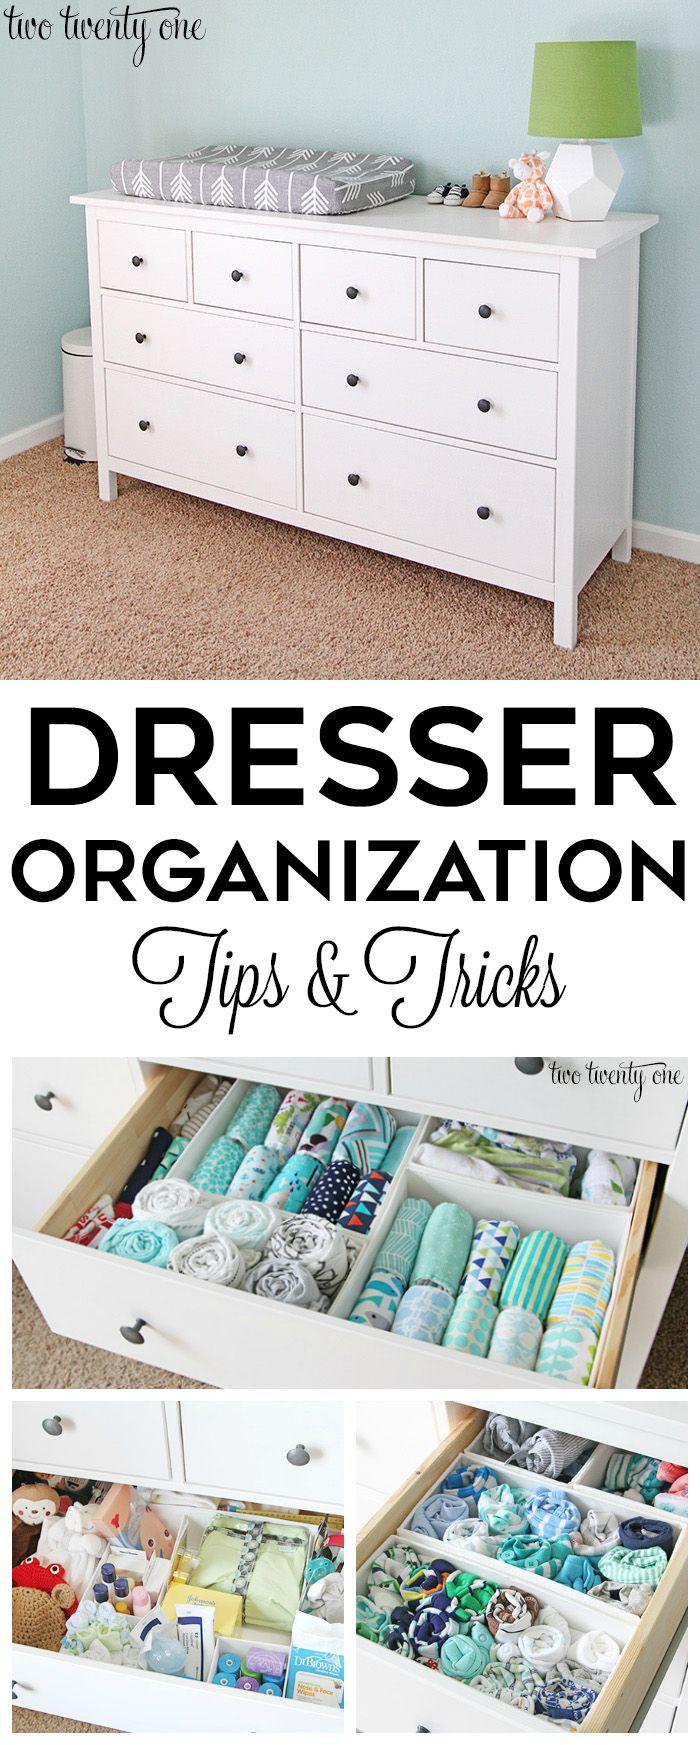 Dresser Organization Tips And Tricks Great Tips And Tricks For An Organized Dresser Especially